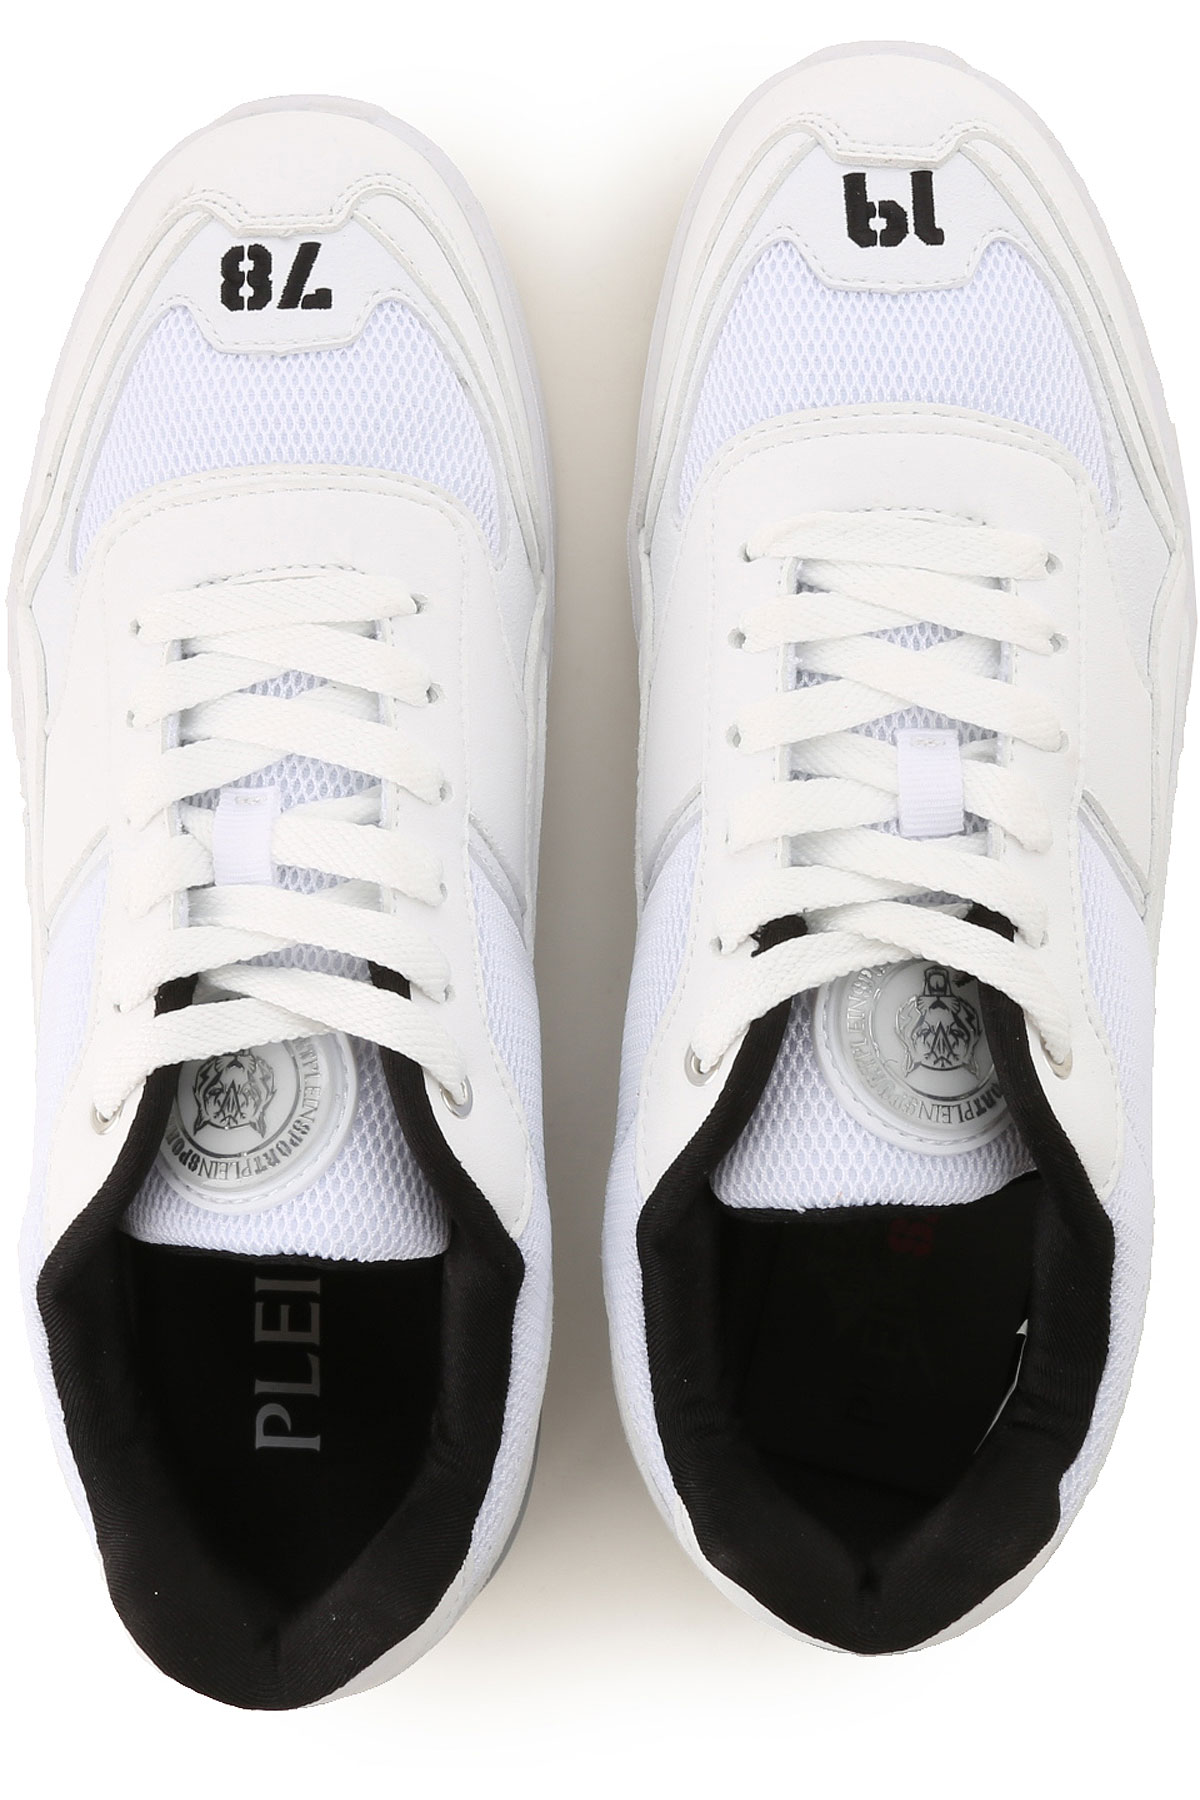 Zapatos 2019 Philipp Para Primavera Blanco Negro Hombres Plein verano qf4vwCT4